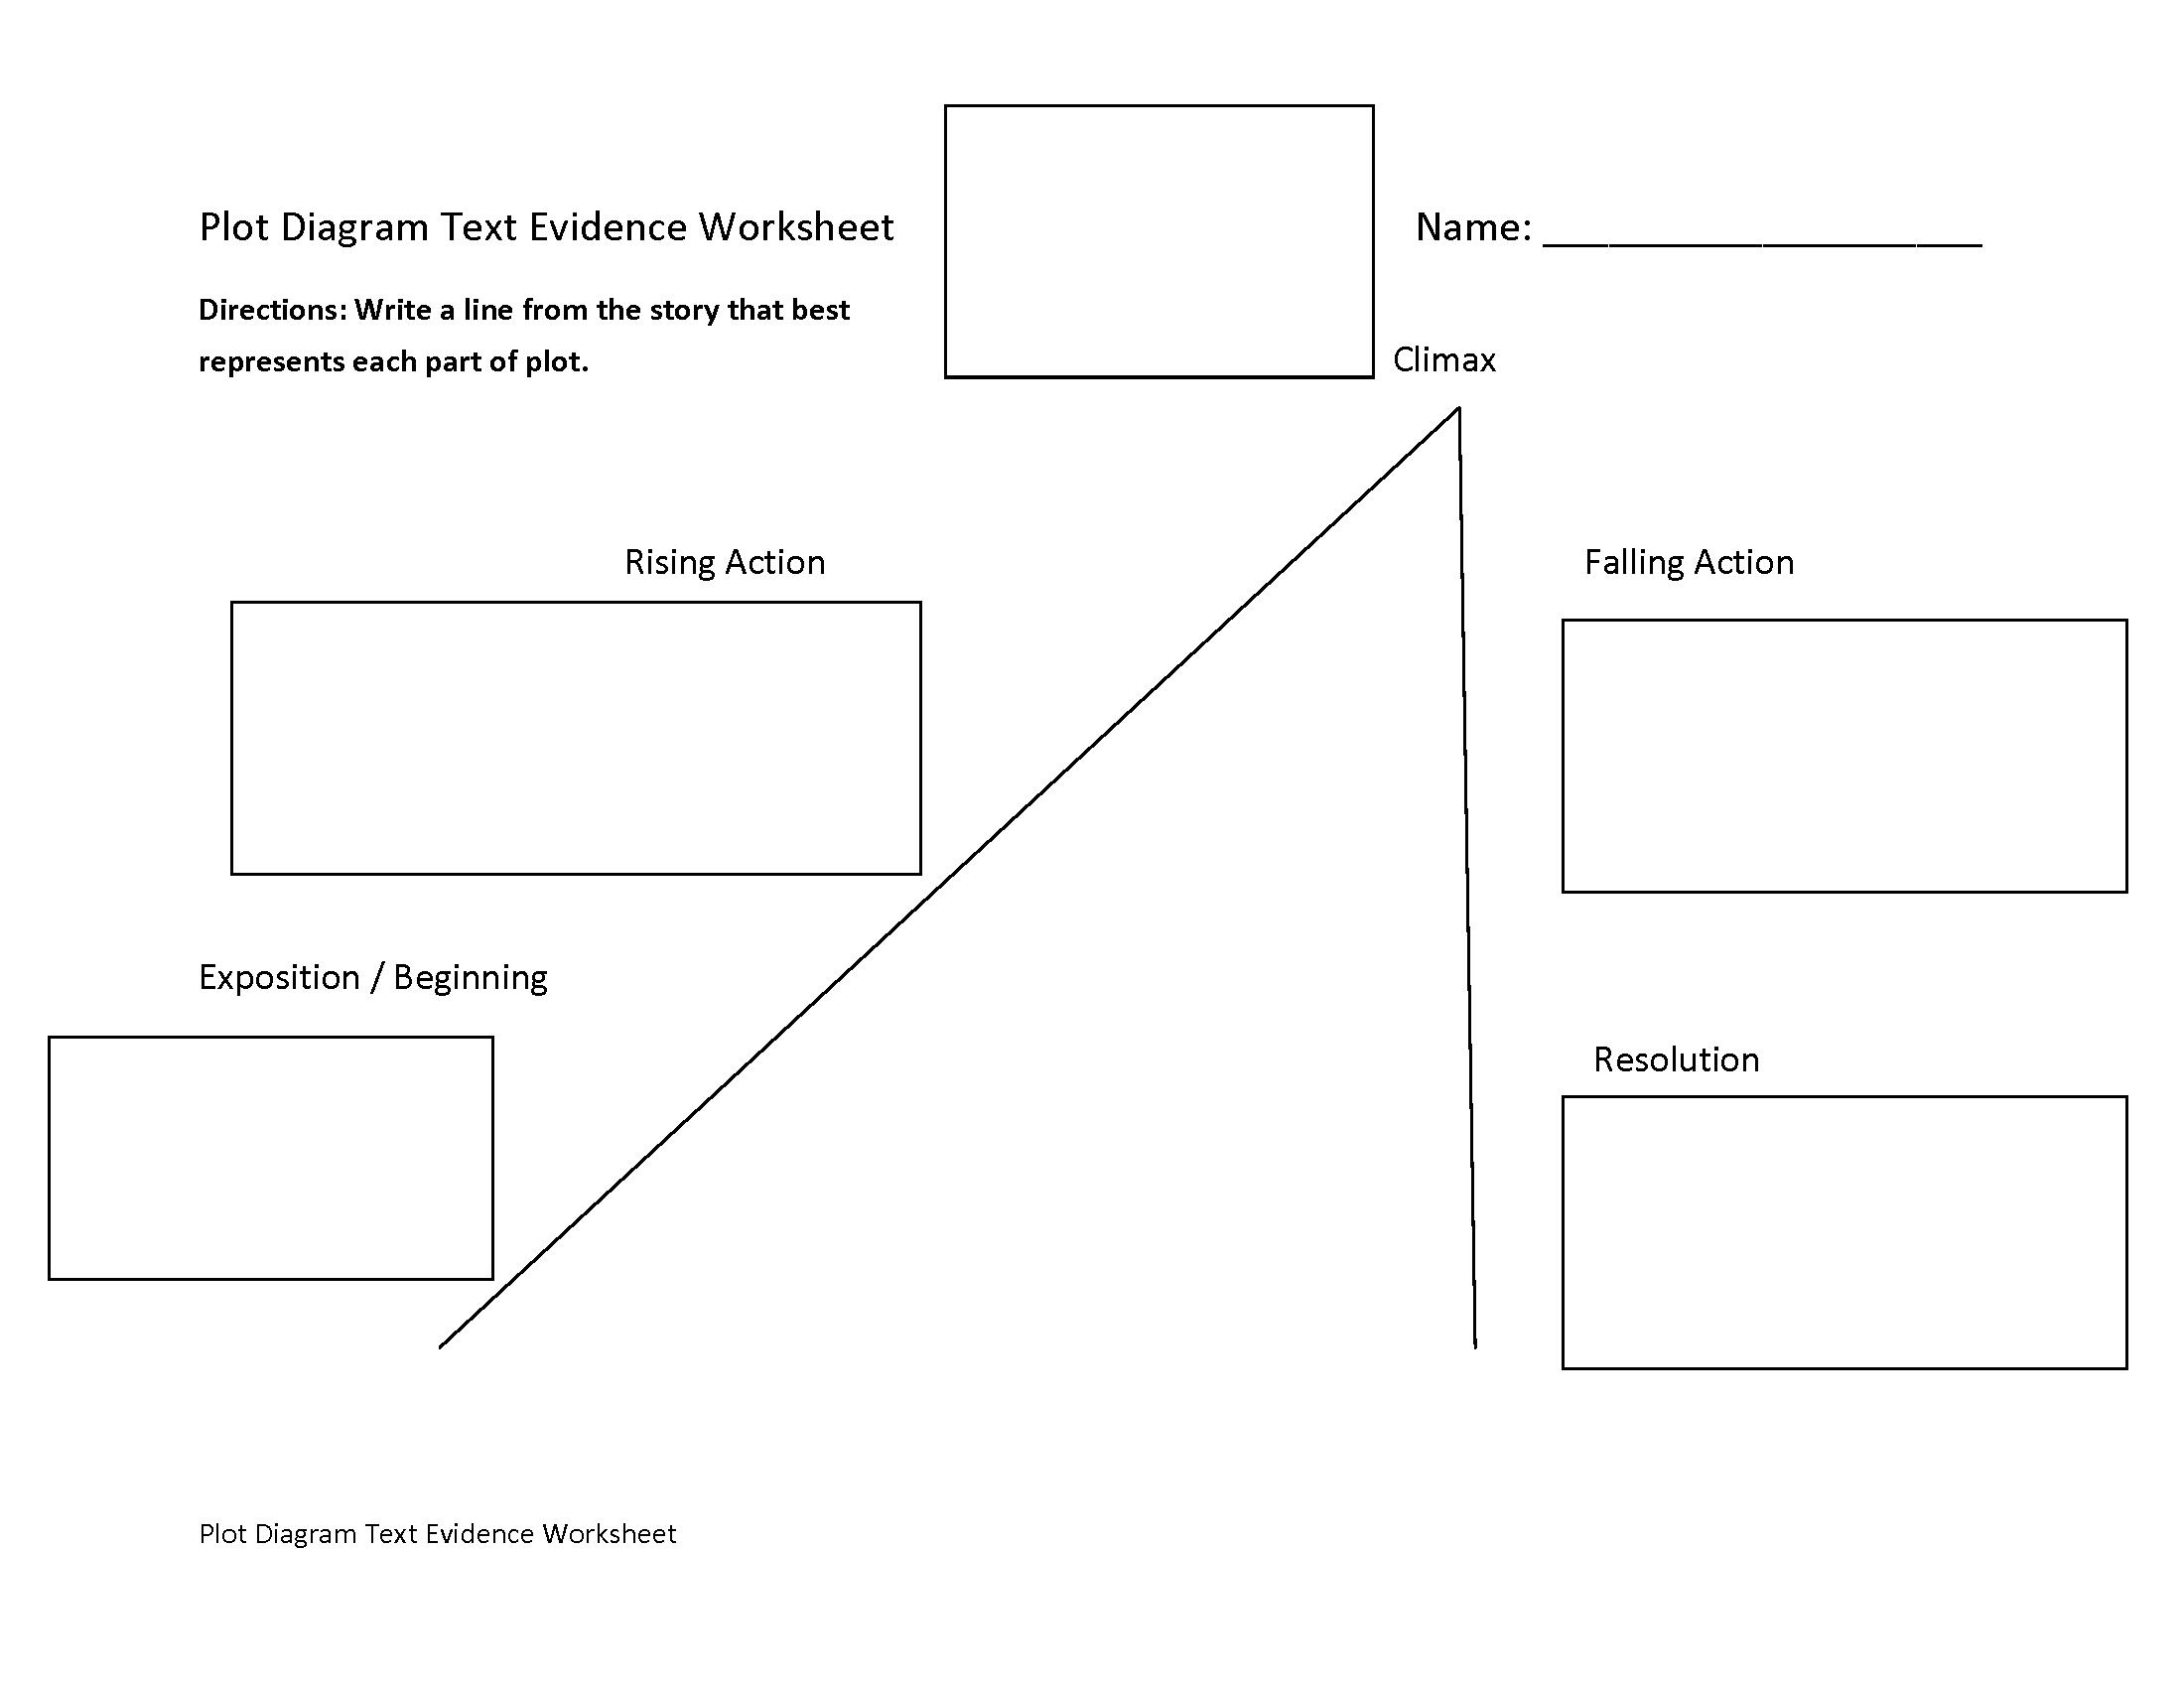 Plot Diagram Text Evidence Worksheet